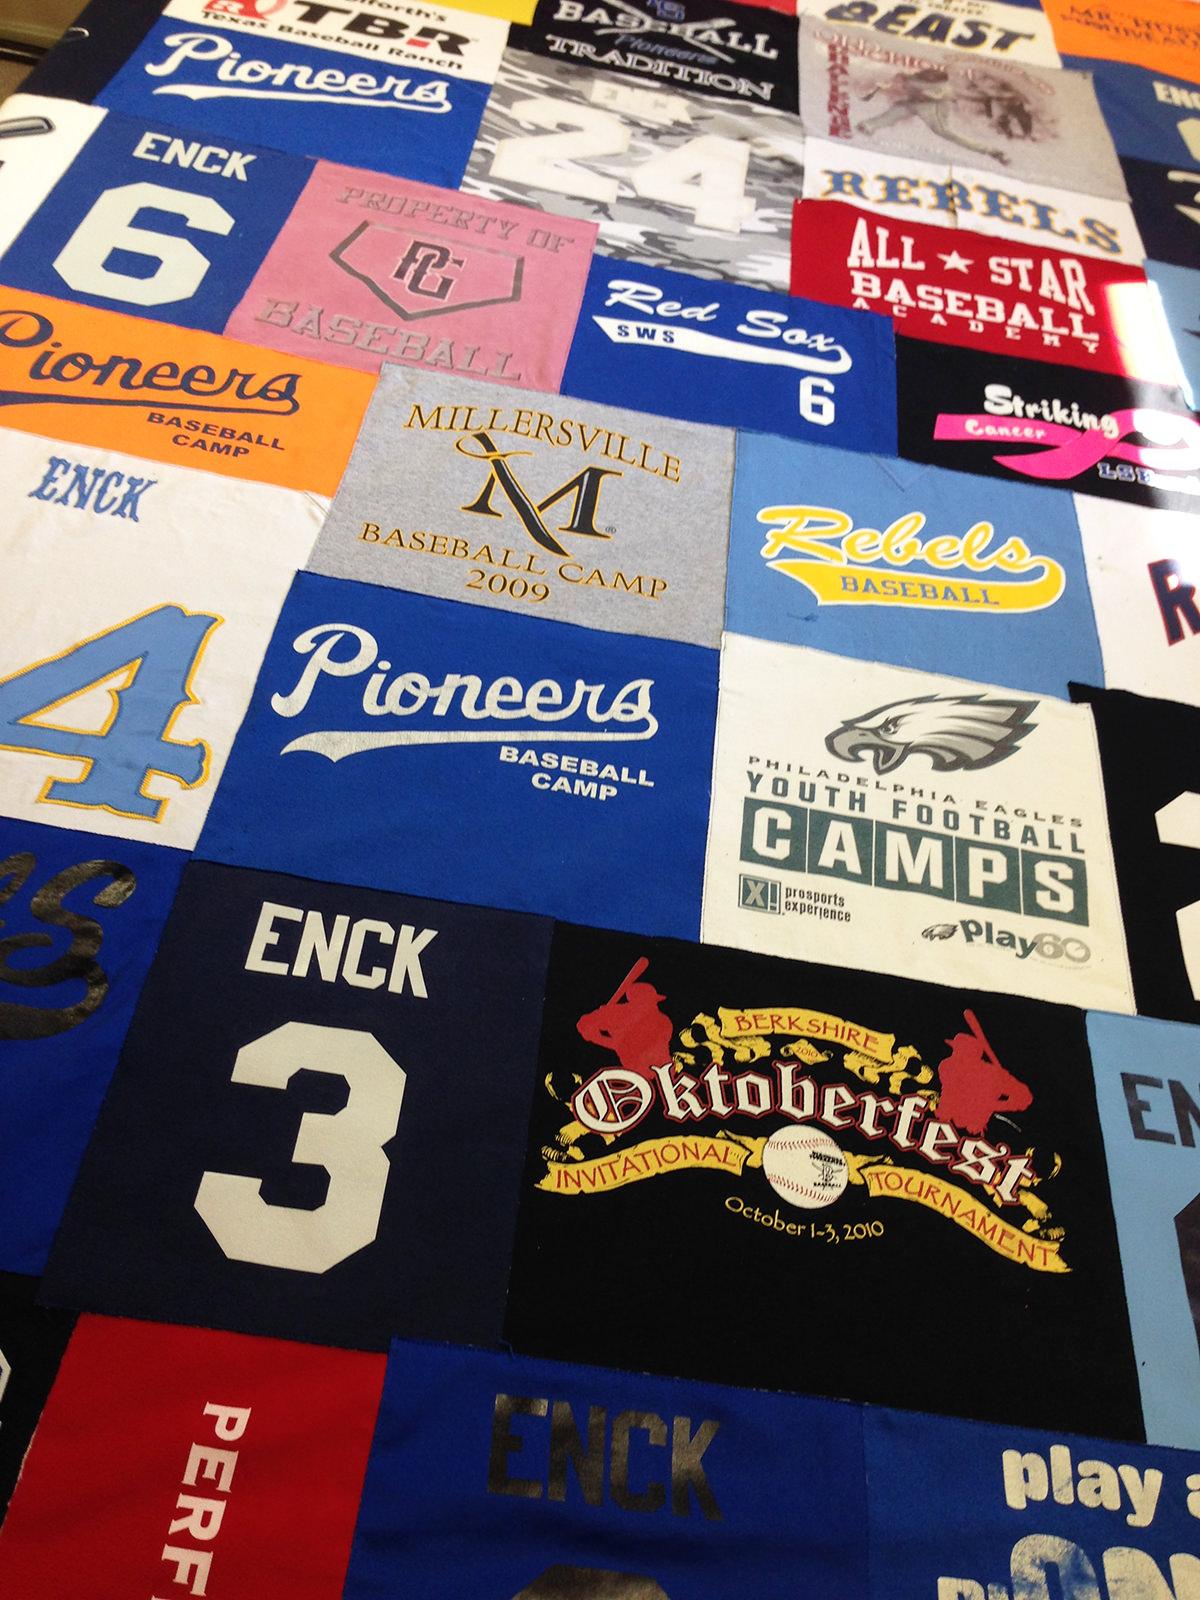 custom-t-shirt-quilts-DBH-designs-willow-street-pennsylvania-2.JPG